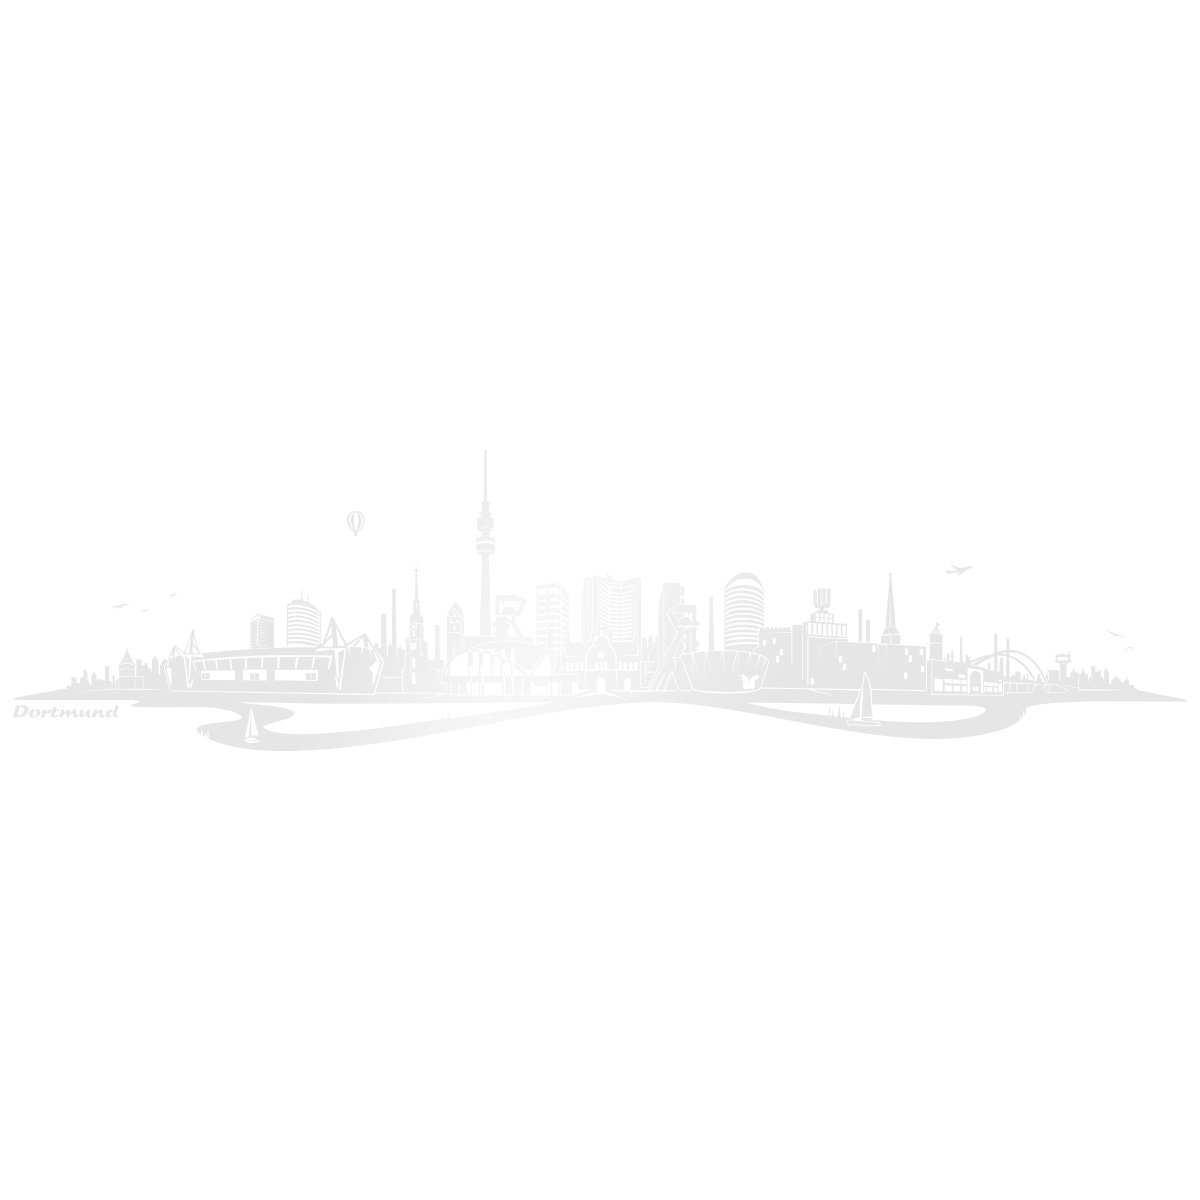 WANDKINGS Wandtattoo Wandtattoo Wandtattoo Skyline Dortmund mit Fluss 140 x 36 cm - Schwarz - 35 Farben zur Wahl B018E9WRW2 Wandtattoos & Wandbilder a912ac